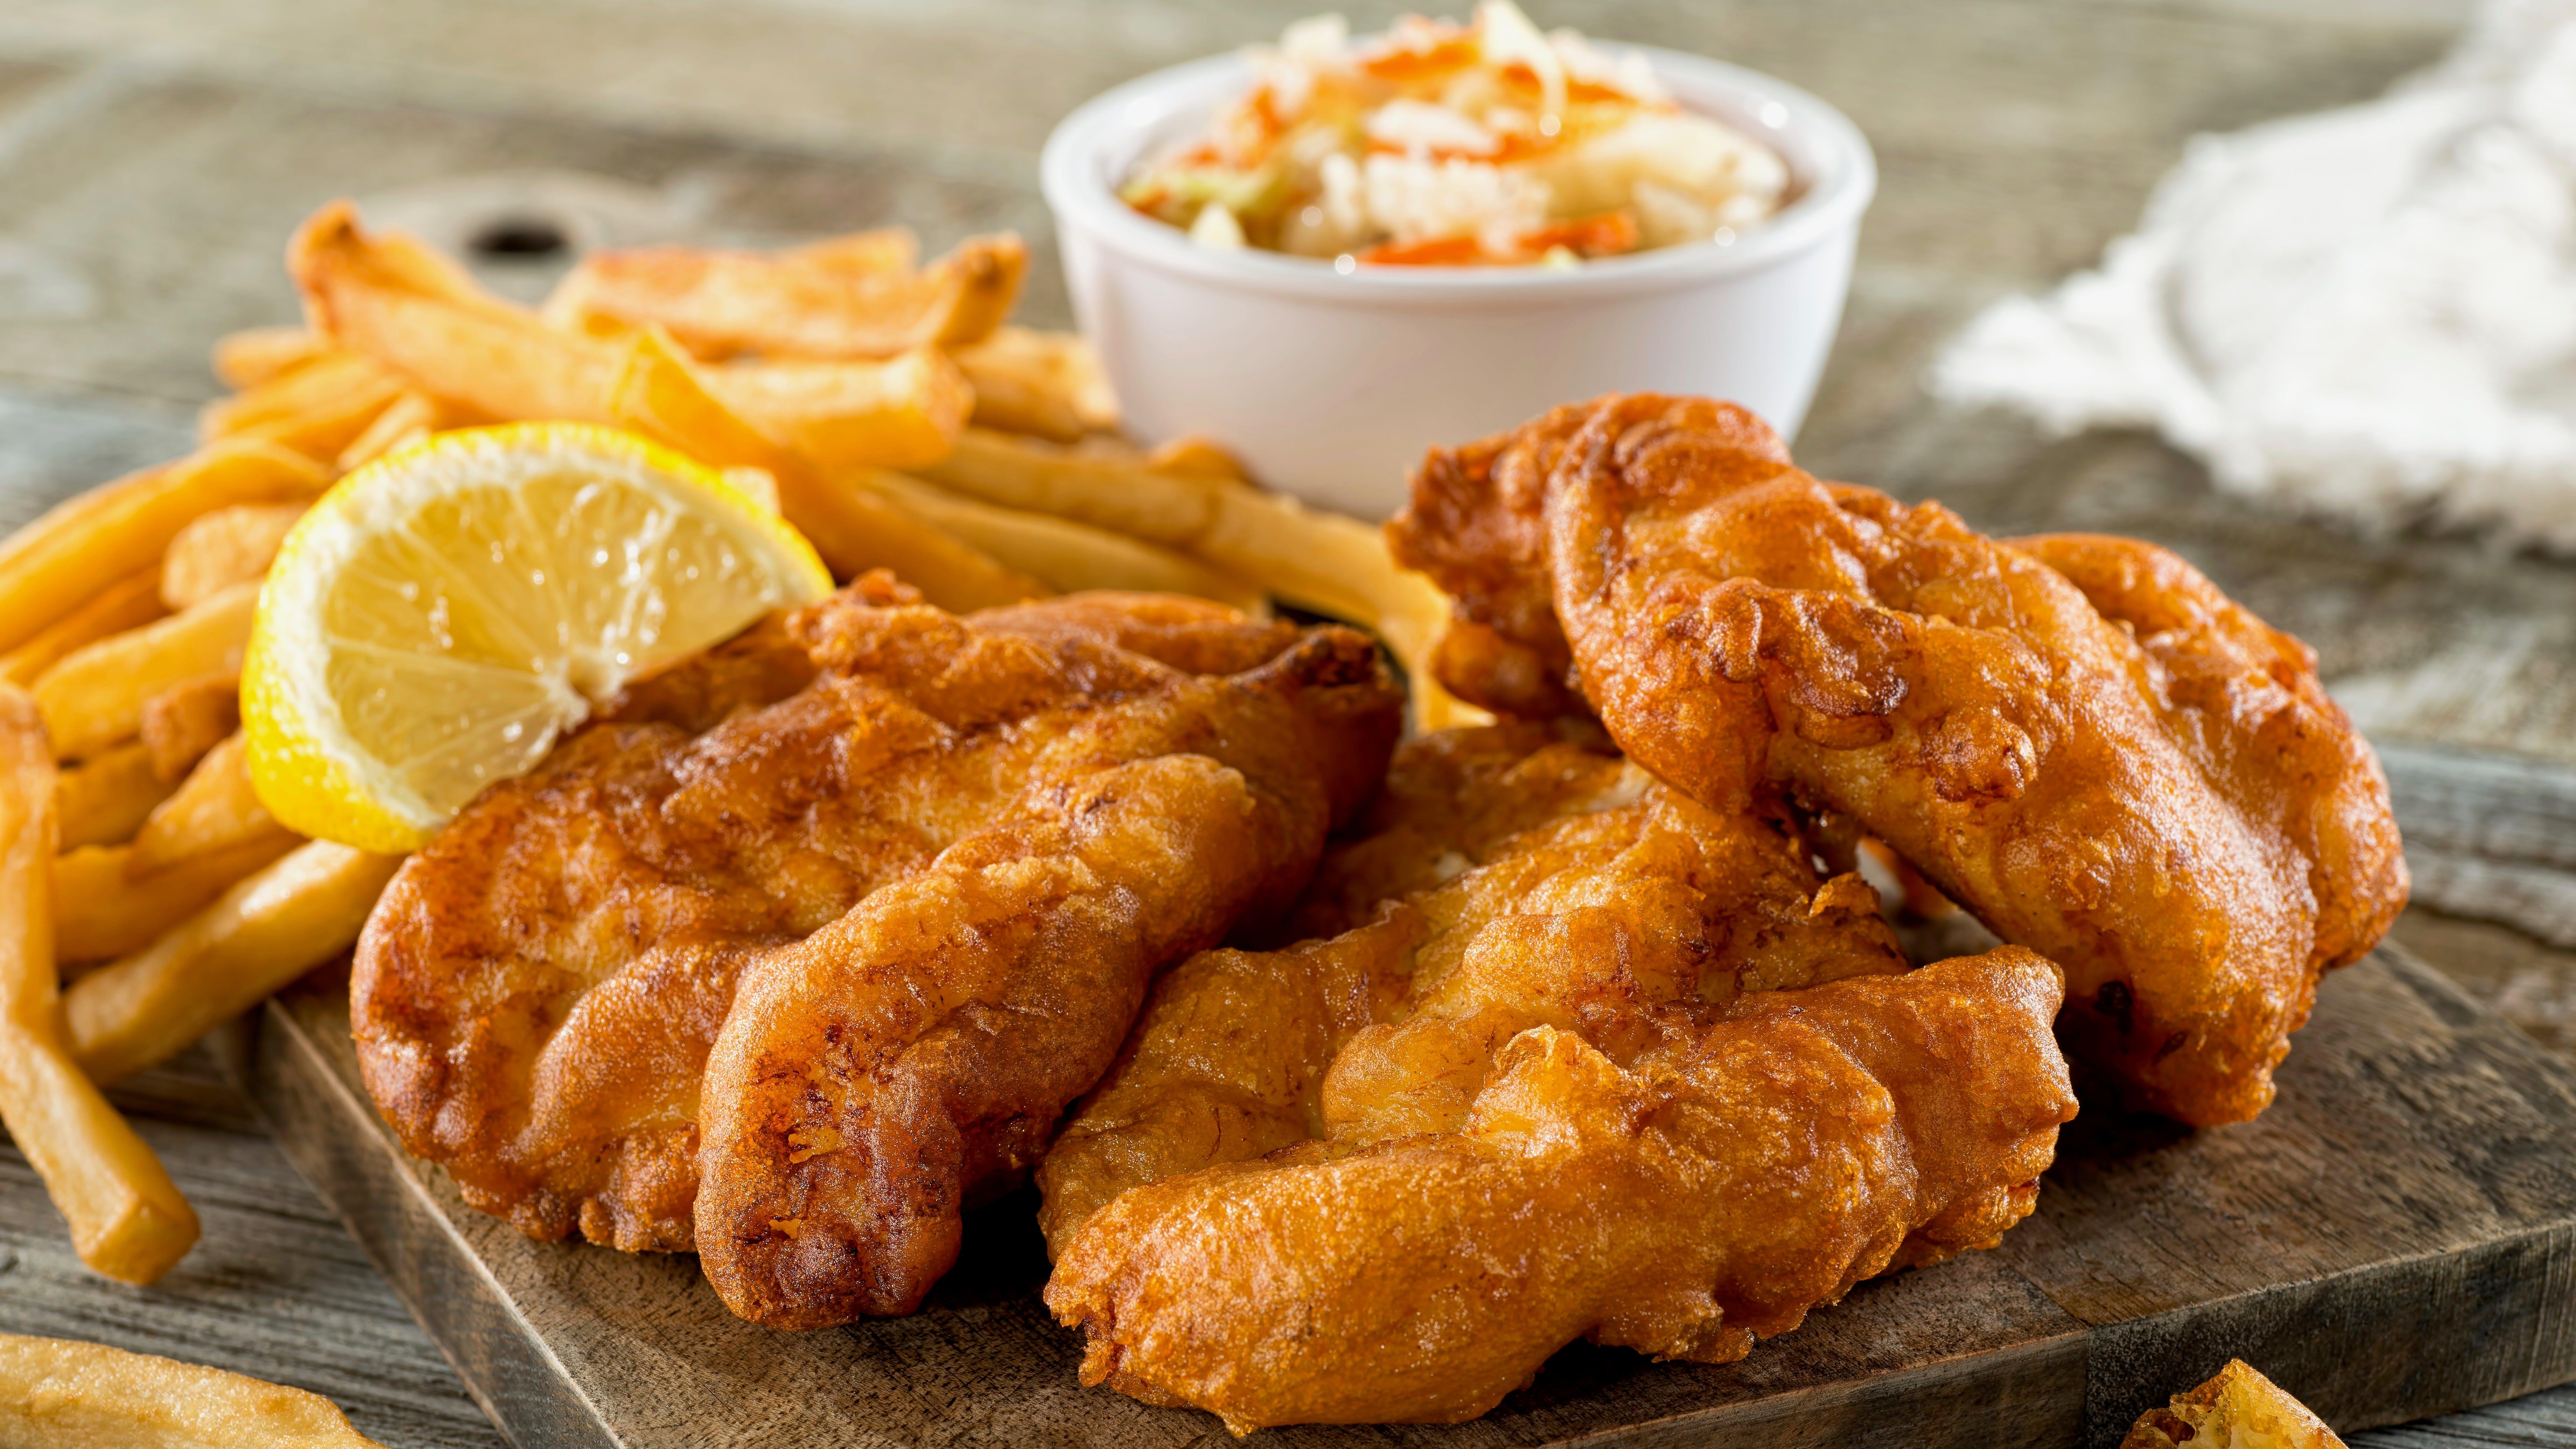 fish & Chips «class =» aligncenter taille-complètement wp-image-3516951 «largeur =» 800 «hauteur =» 450 «srcset =» https://i.dietdoctor.com/wp-content/uploads/2019/01/Fried-Food.jpg?Auto=compress%2Cformat&w=150&h=84&Fit=crop 150w, 200w https://i.dietdoctor.com/wp-content/uploads/2019/01/Fried-food.jpg?auto=compress%2Cformat&w=267&h=150&fit=crop https://i.dietdoctor.com/wp-content/uploads/2019/01/Fried-food.jpg?auto=compress%2Cformat&w=200&h=113&fit=crop, 267w, https://i.dietdoctor.com/wp-content/uploads/2019/01/Fried-foOD. auto compresser jpg? = % 2Cformat & w = 400 & h = 225 & fit = crop 400w, 800w, 1600w https://i.dietdoctor.com/wp-content/uploads/2019/01/Fried-food.jpg?auto=compress%2Cformat&w=800&h=450&fit=crop https://i.dietdoctor.com/wp-content/uploads/2019/01/Fried-food.jpg?auto=compress%2Cformat&w=1600&h=900&fit=crop «taille =» (max-width: 769px), 100vw (min-width: 1200px) 800px, calcium (100vw-300px)